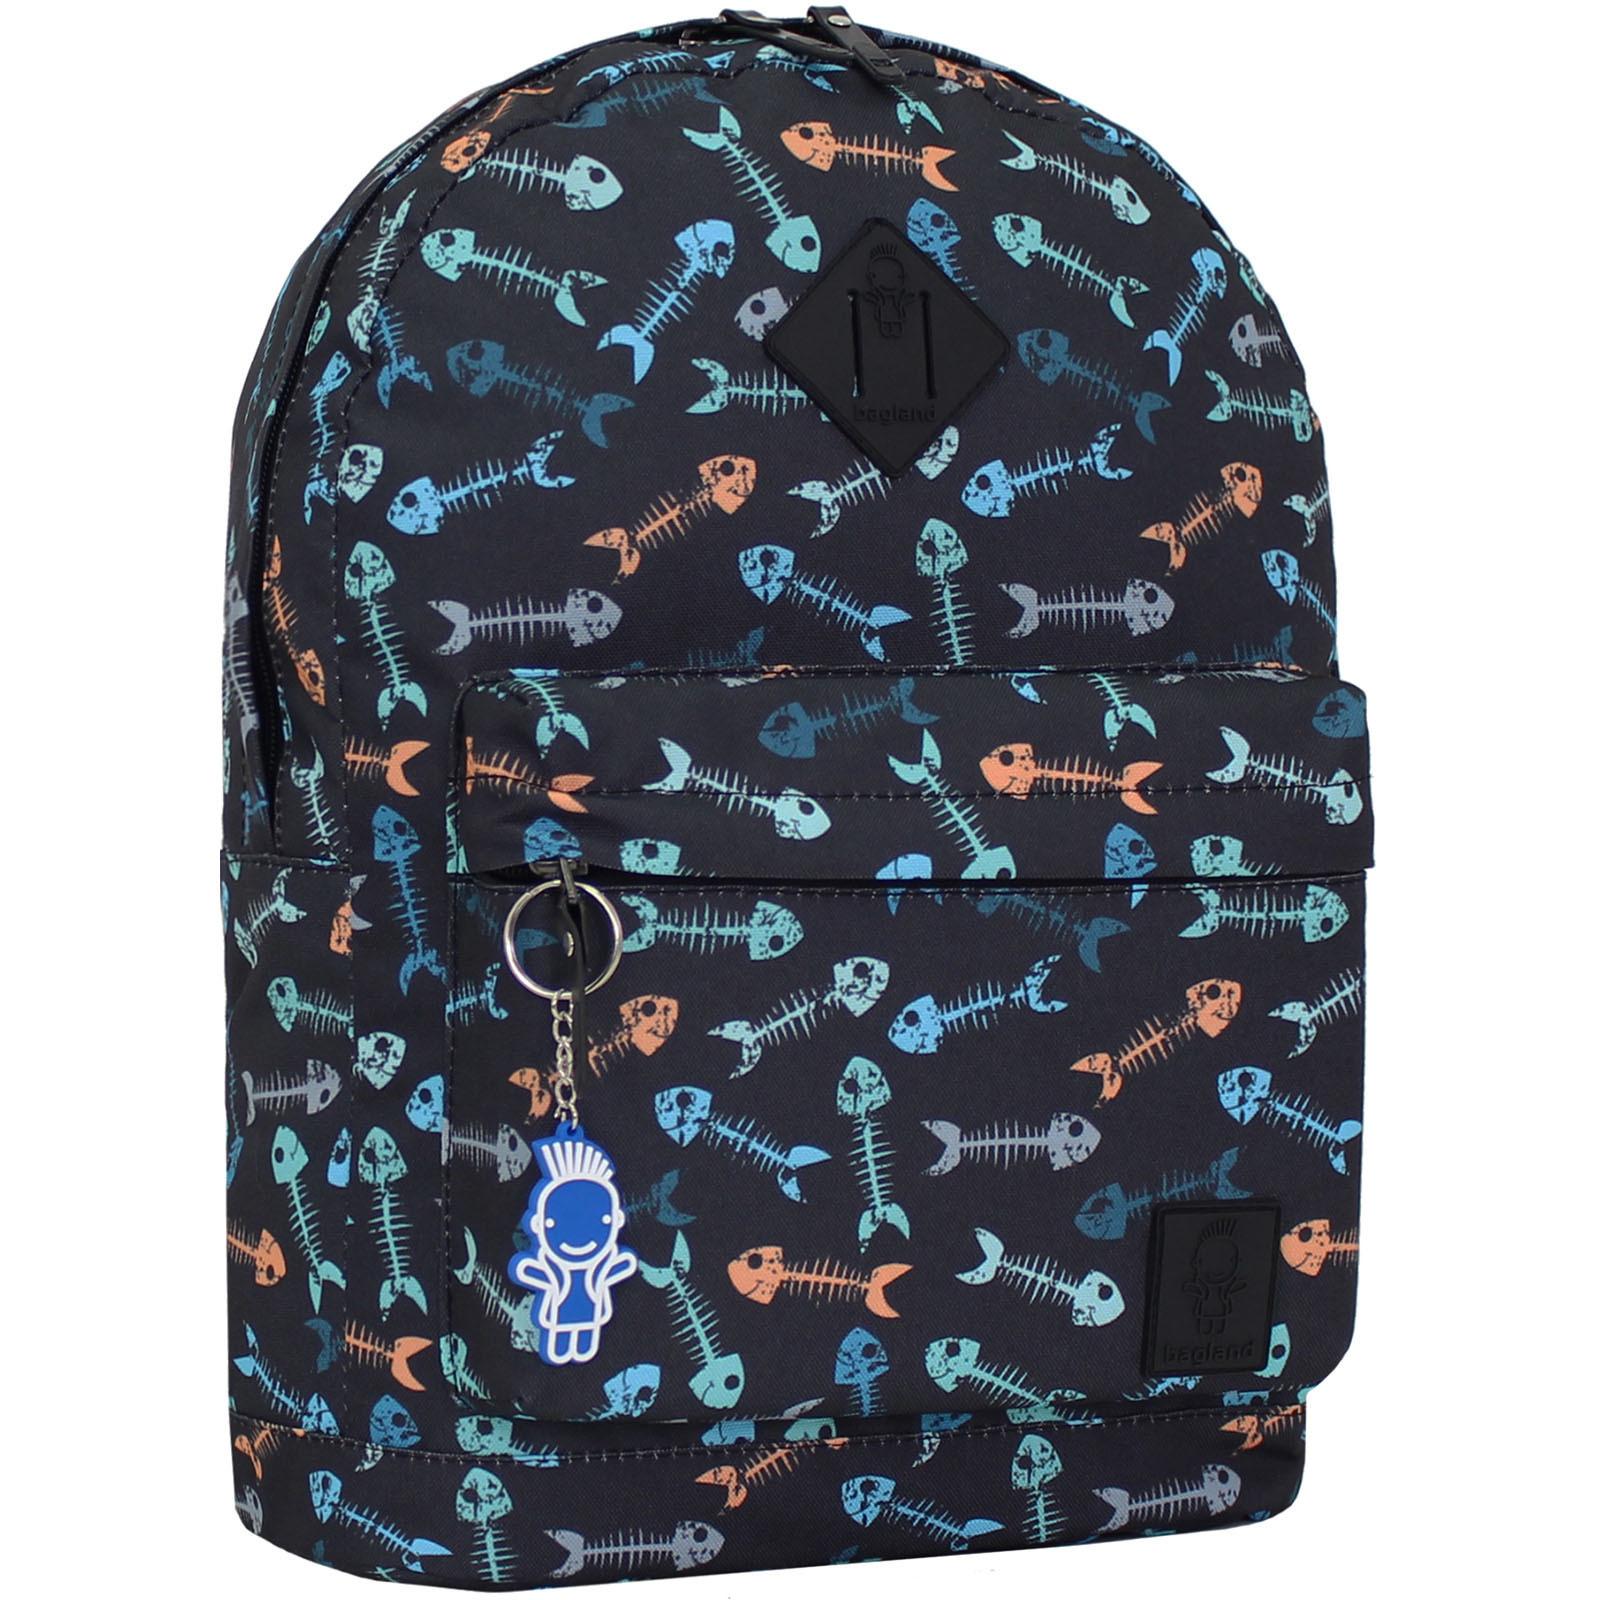 Городские рюкзаки Рюкзак Bagland Молодежный (дизайн) 17 л. сублимация 218 (00533664) IMG_1174_218.JPG